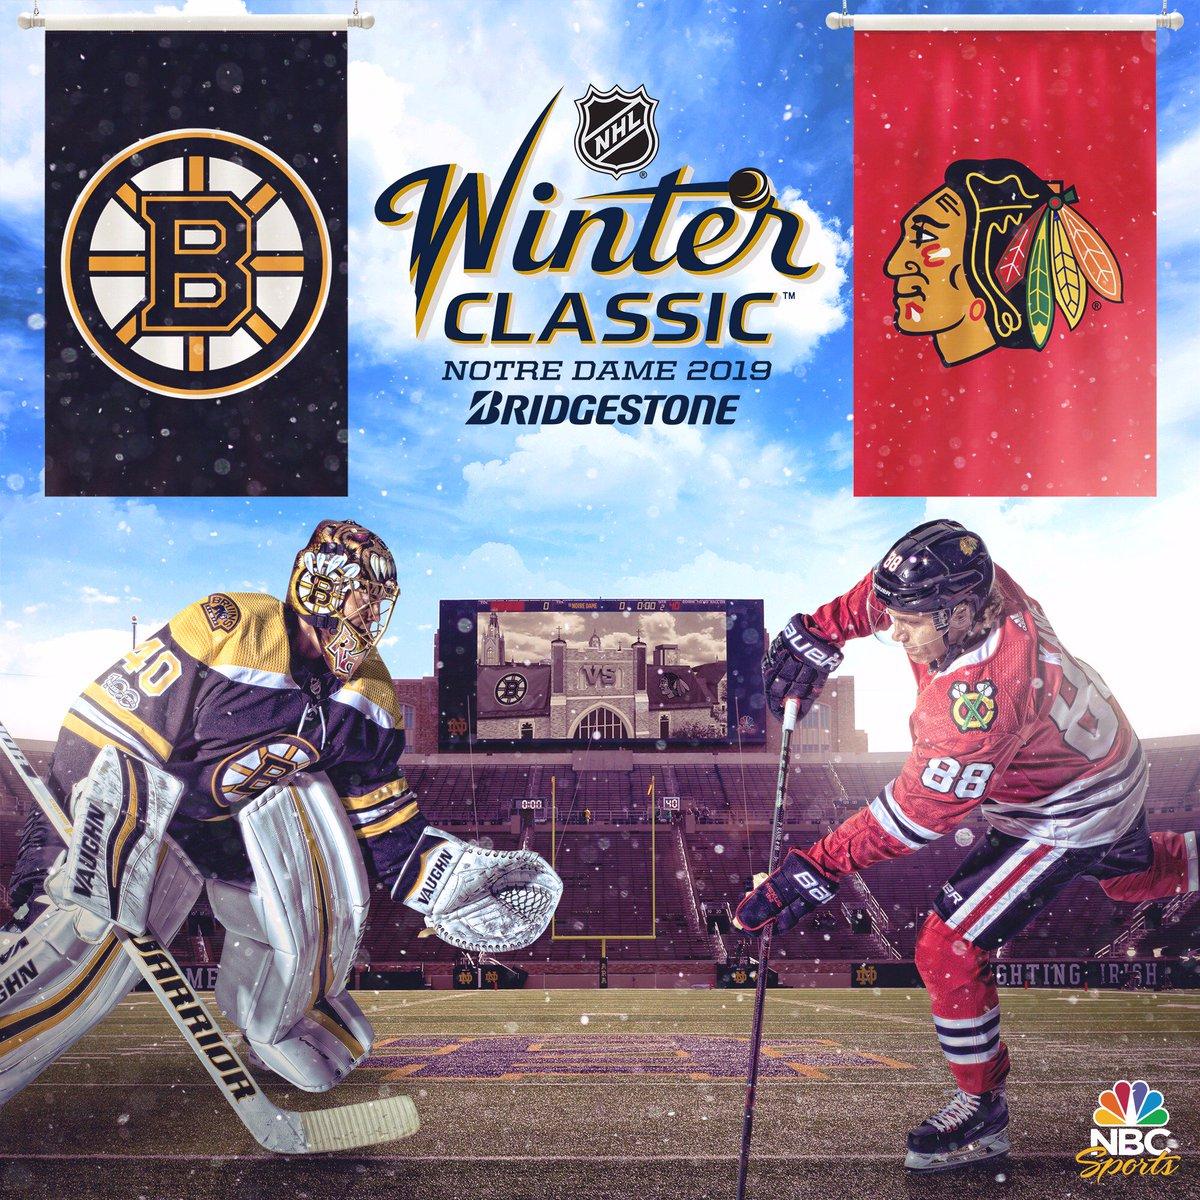 b2205a483 NHL on NBC on Twitter